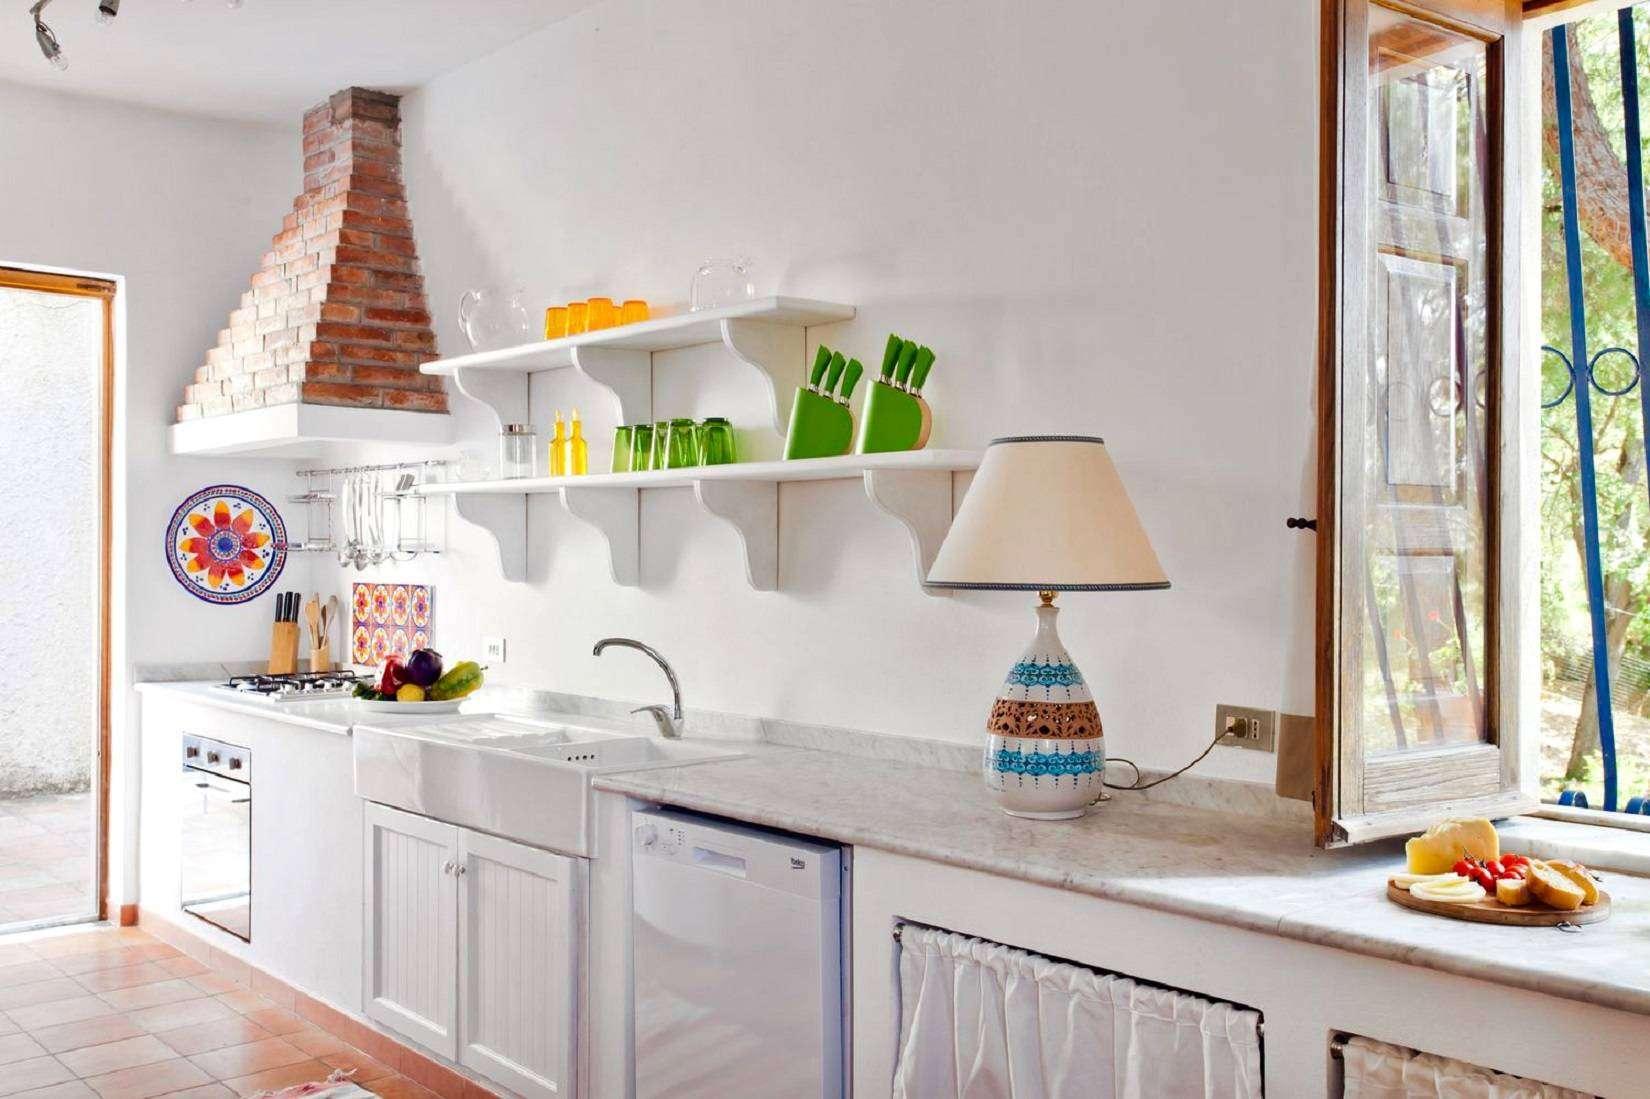 4 La Rocca Kitchen